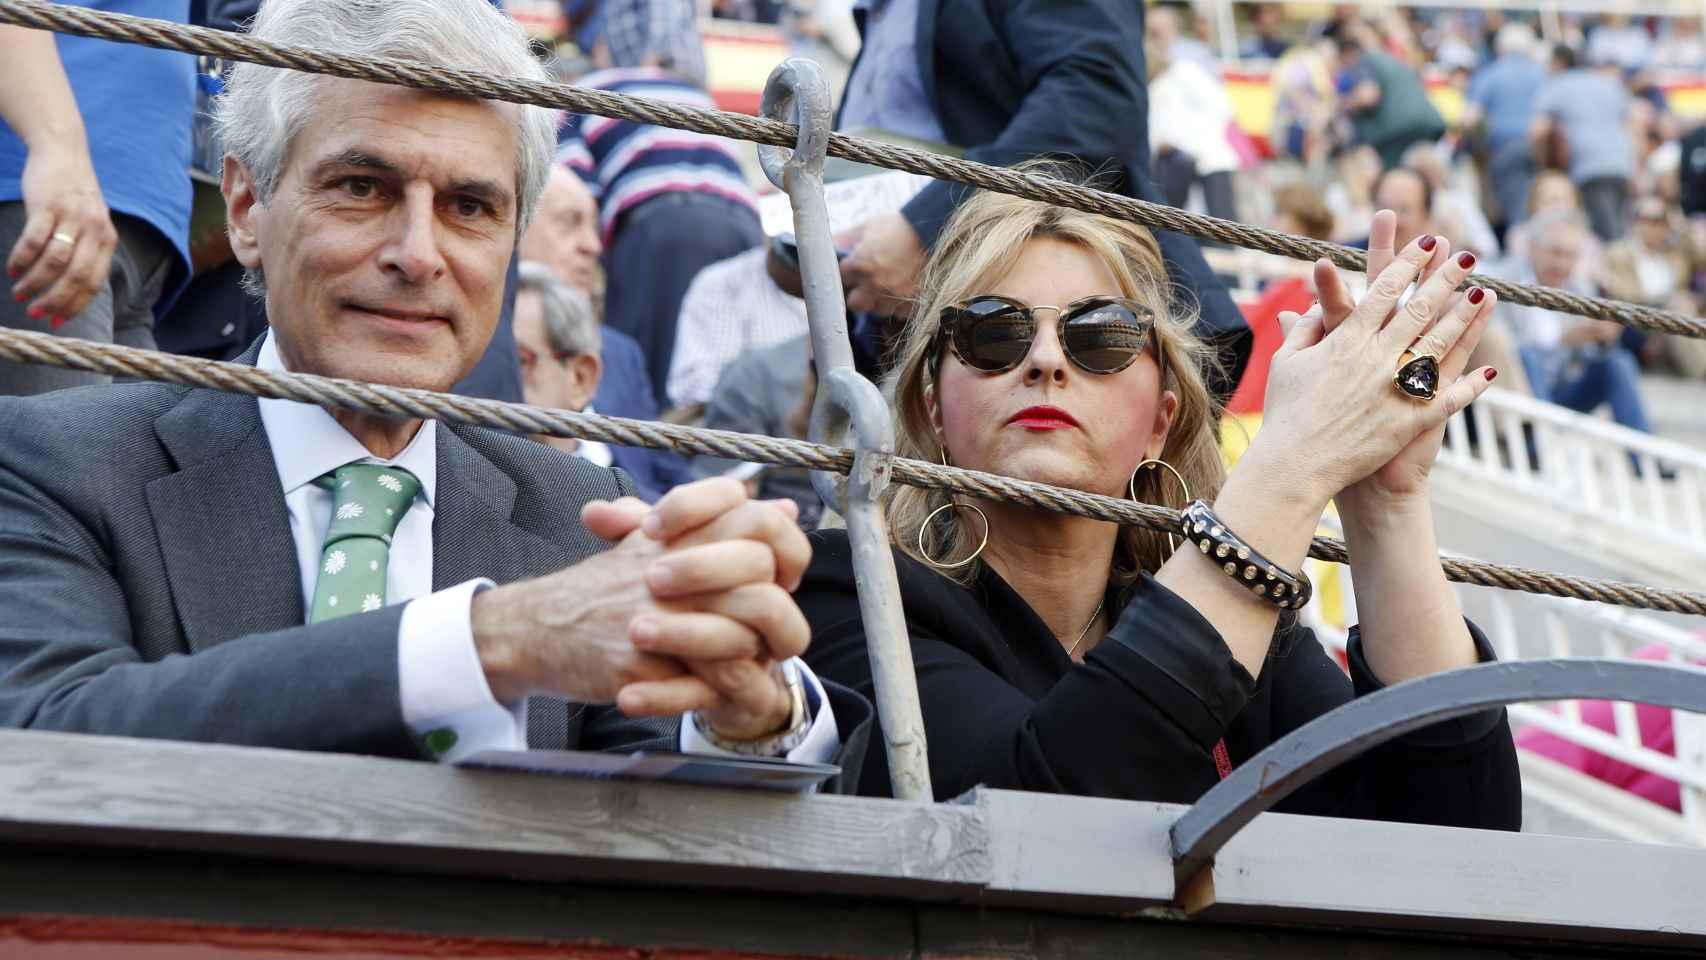 Las 'celebrities' se juntan en los toros de 'San Isidiro'